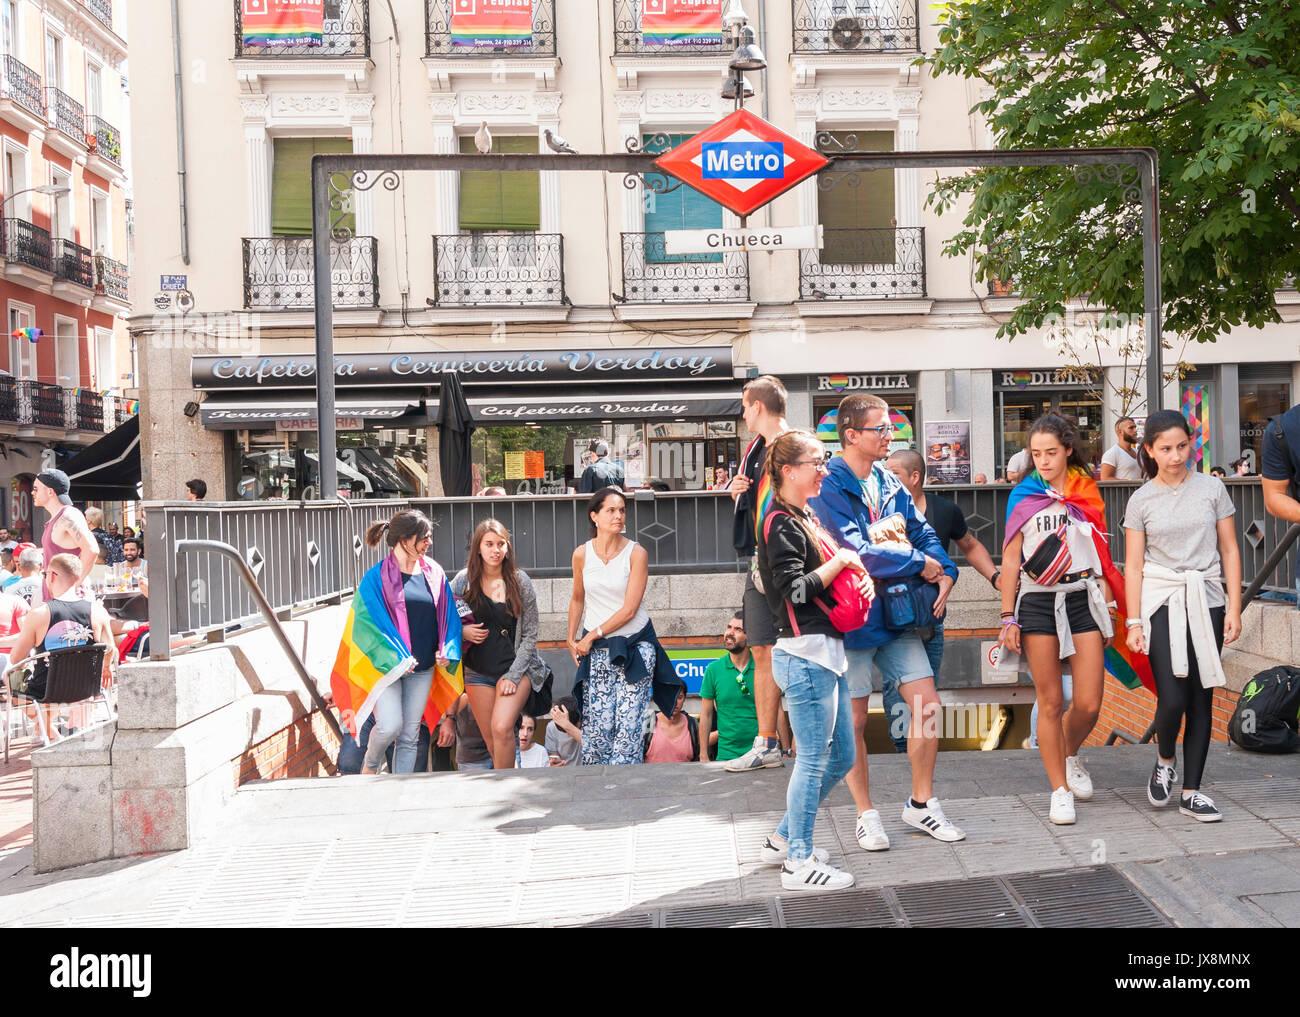 Chat Gay Madrid Gratis